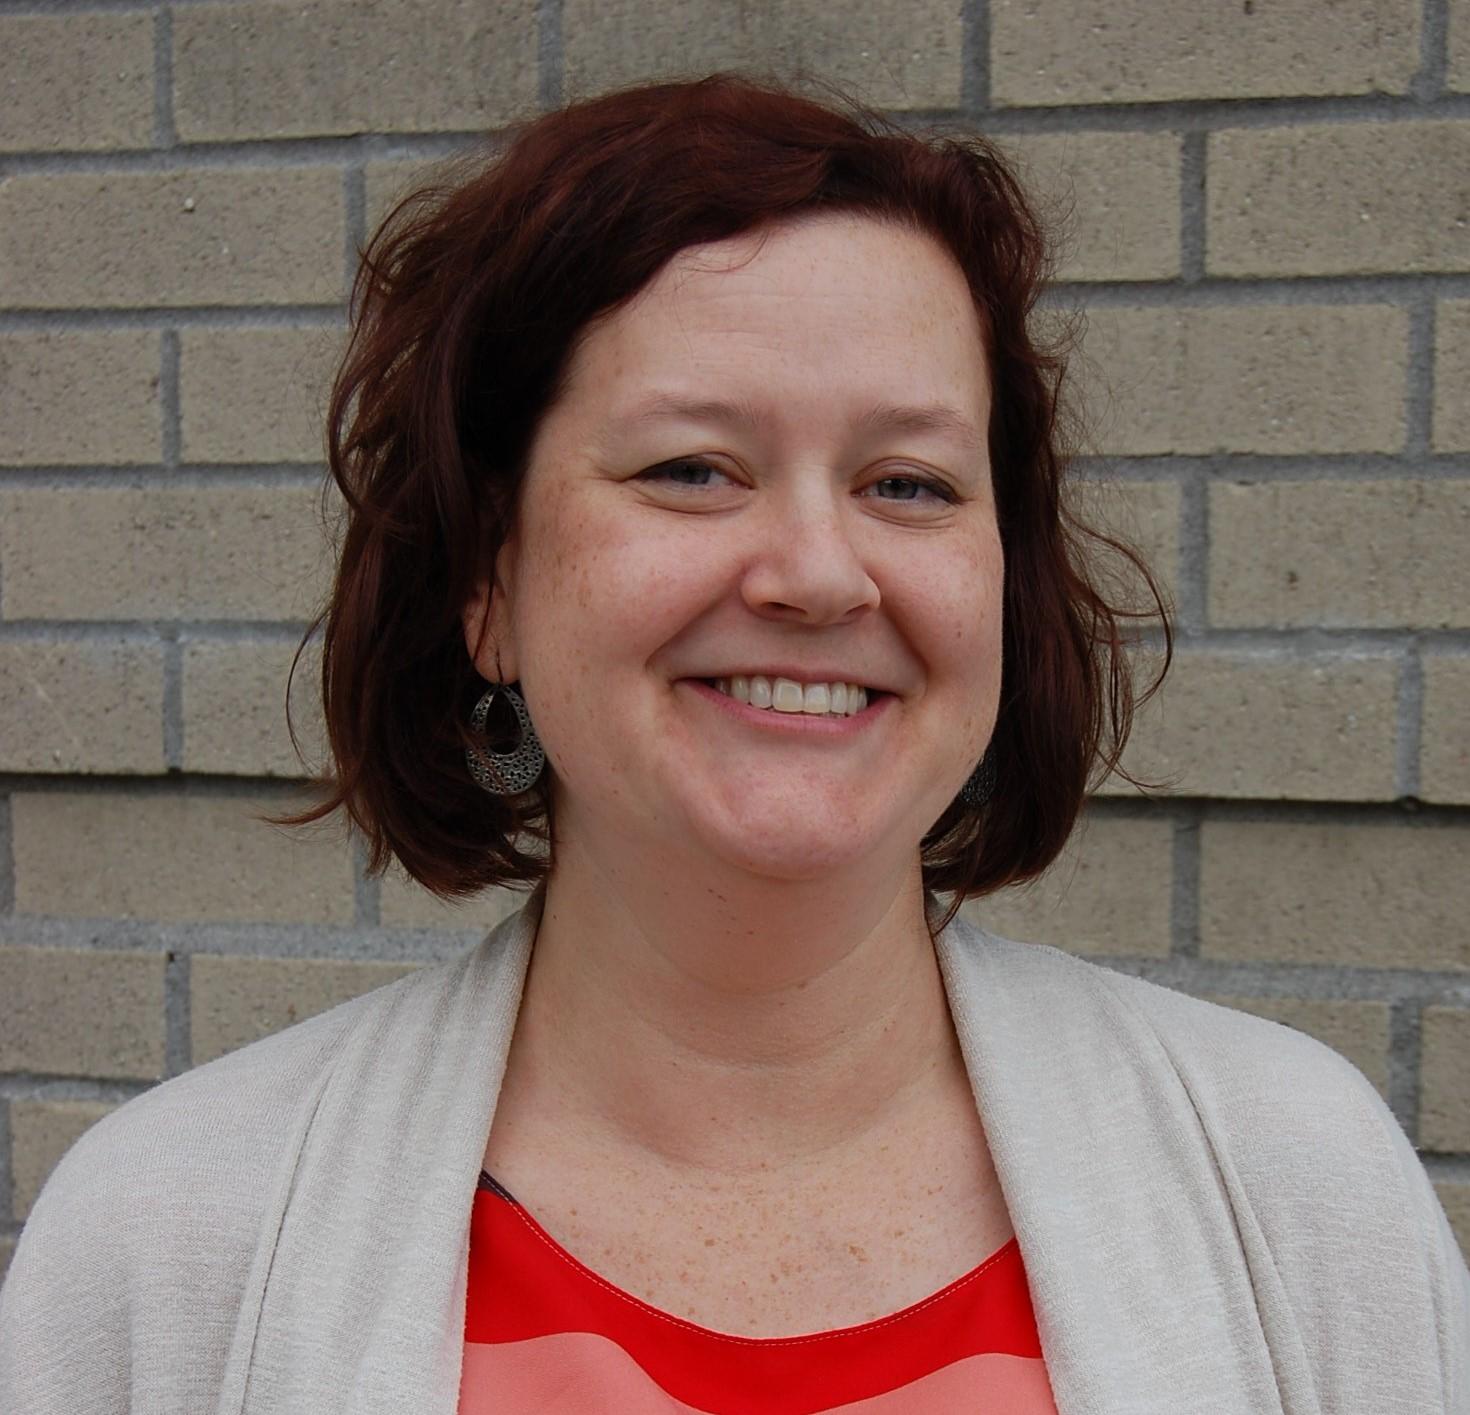 Photo of Erin Doyle